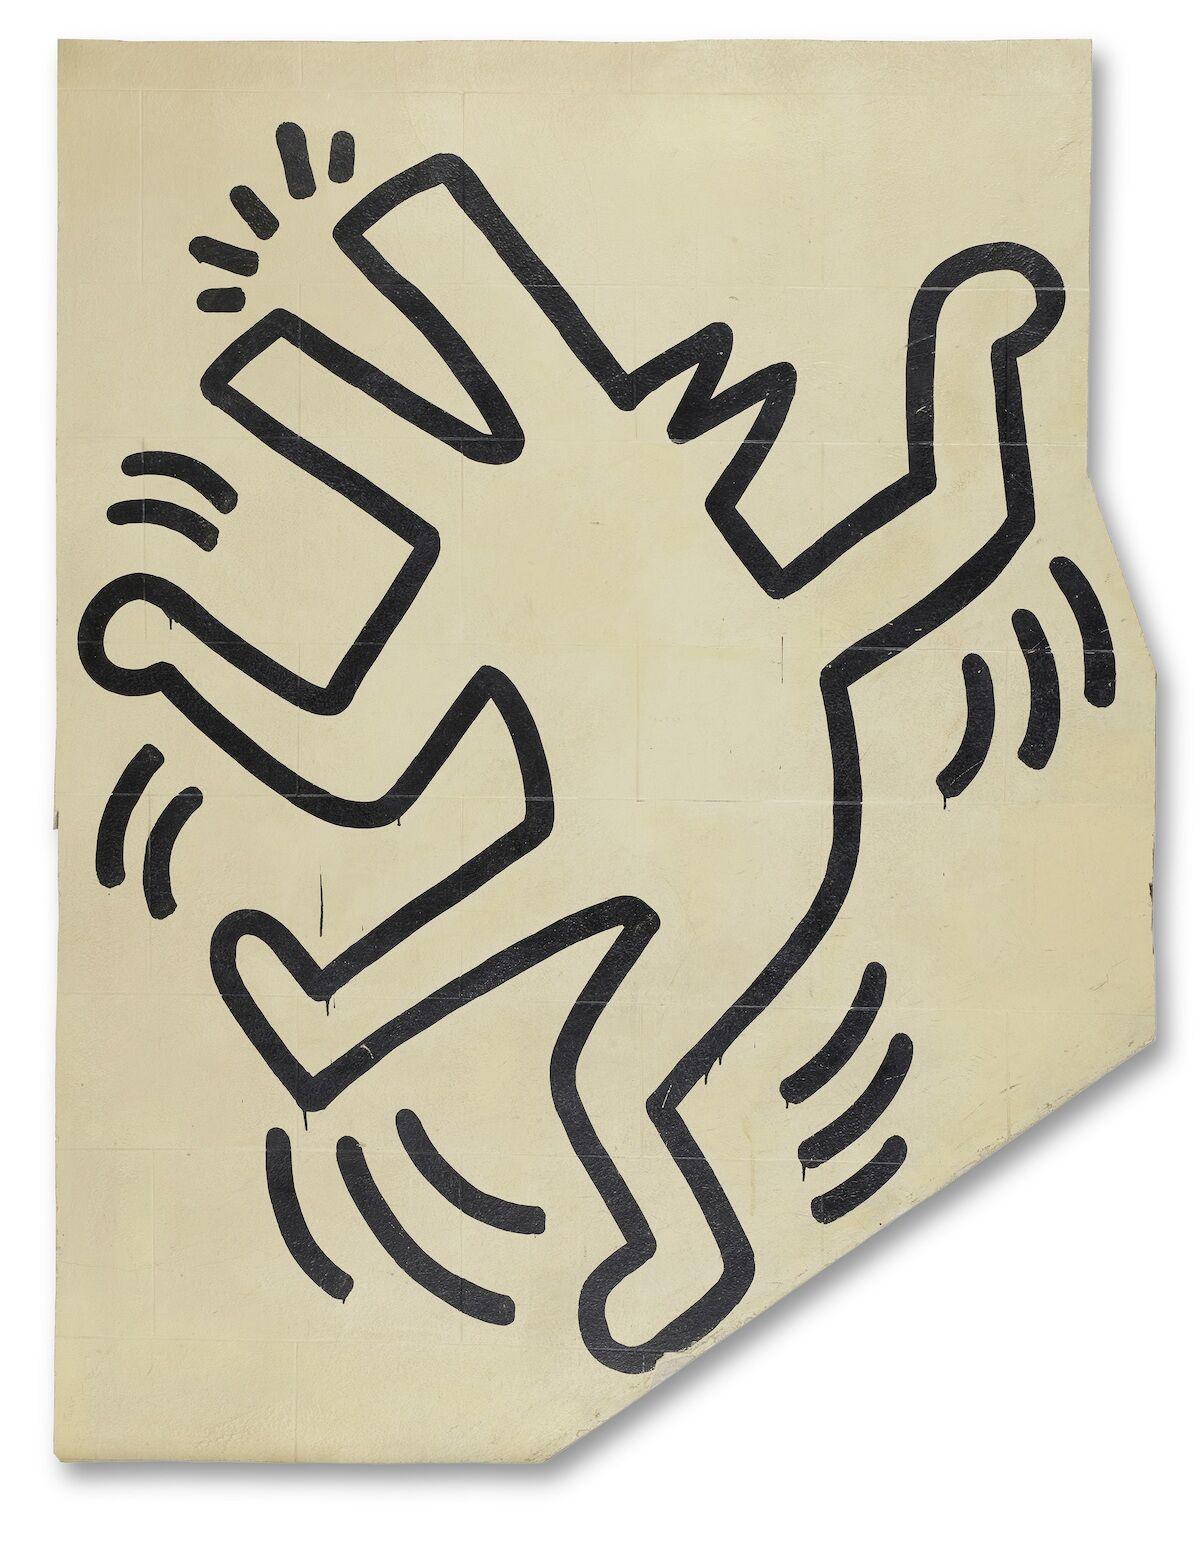 Keith Haring, Untitled (The Grace House Mural) (detail), ca. 1983–84. Est. $3 million–$5 million. Courtesy Bonhams.